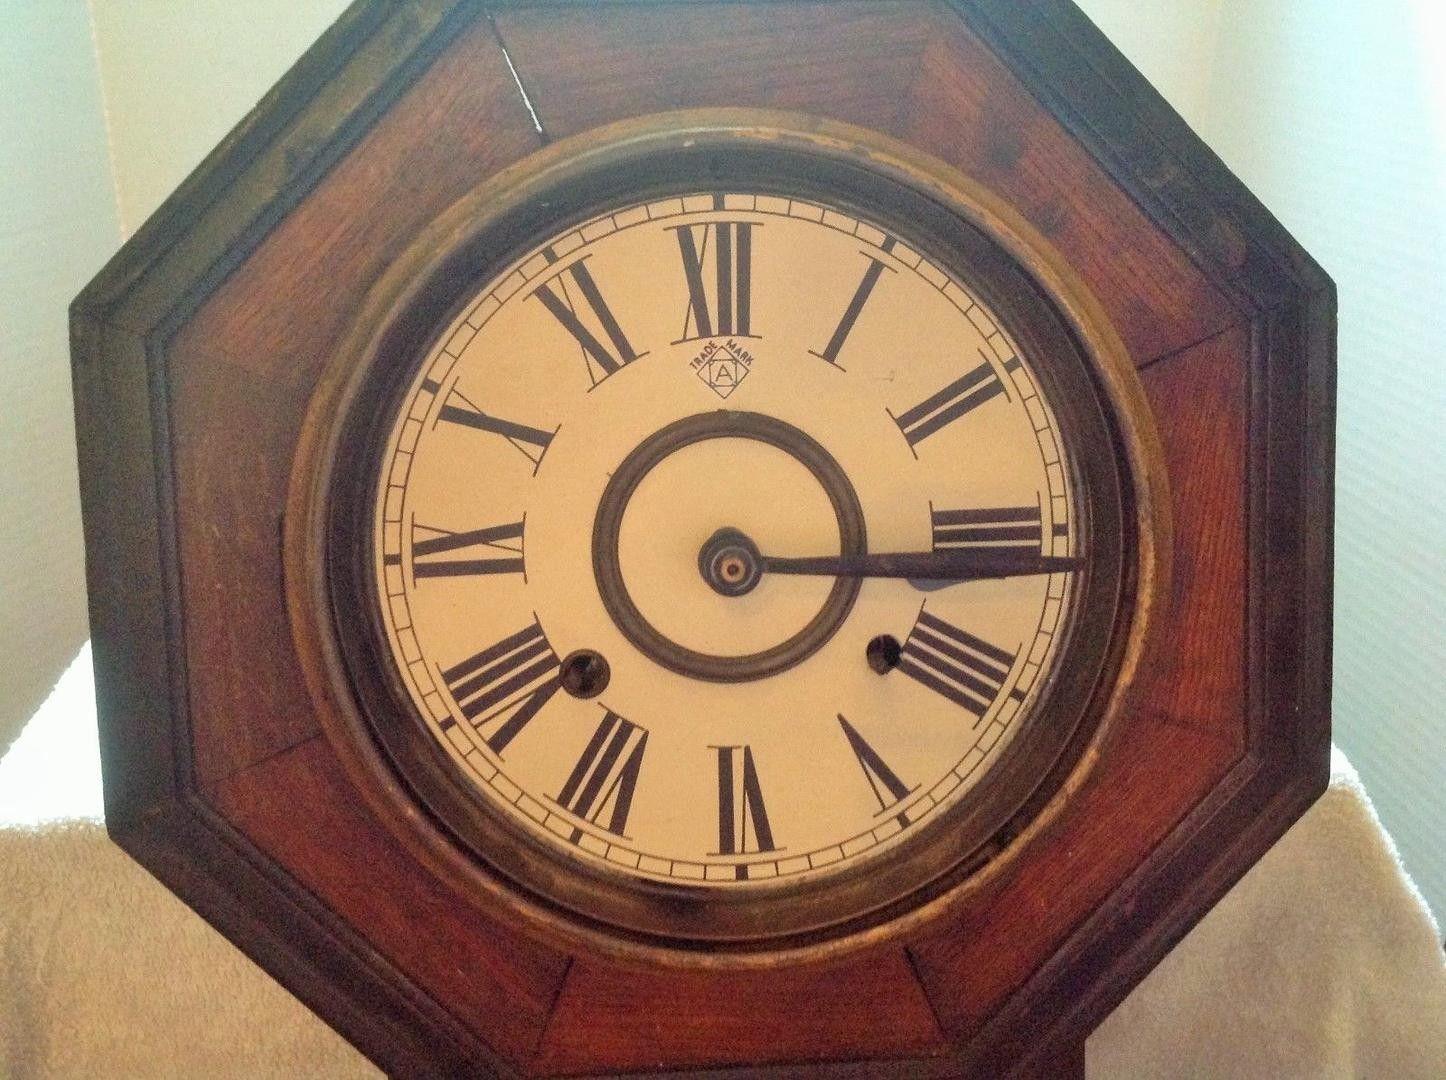 Antique Ansonia Wooden Regulator Schoolhouse Wall Clock Octagon